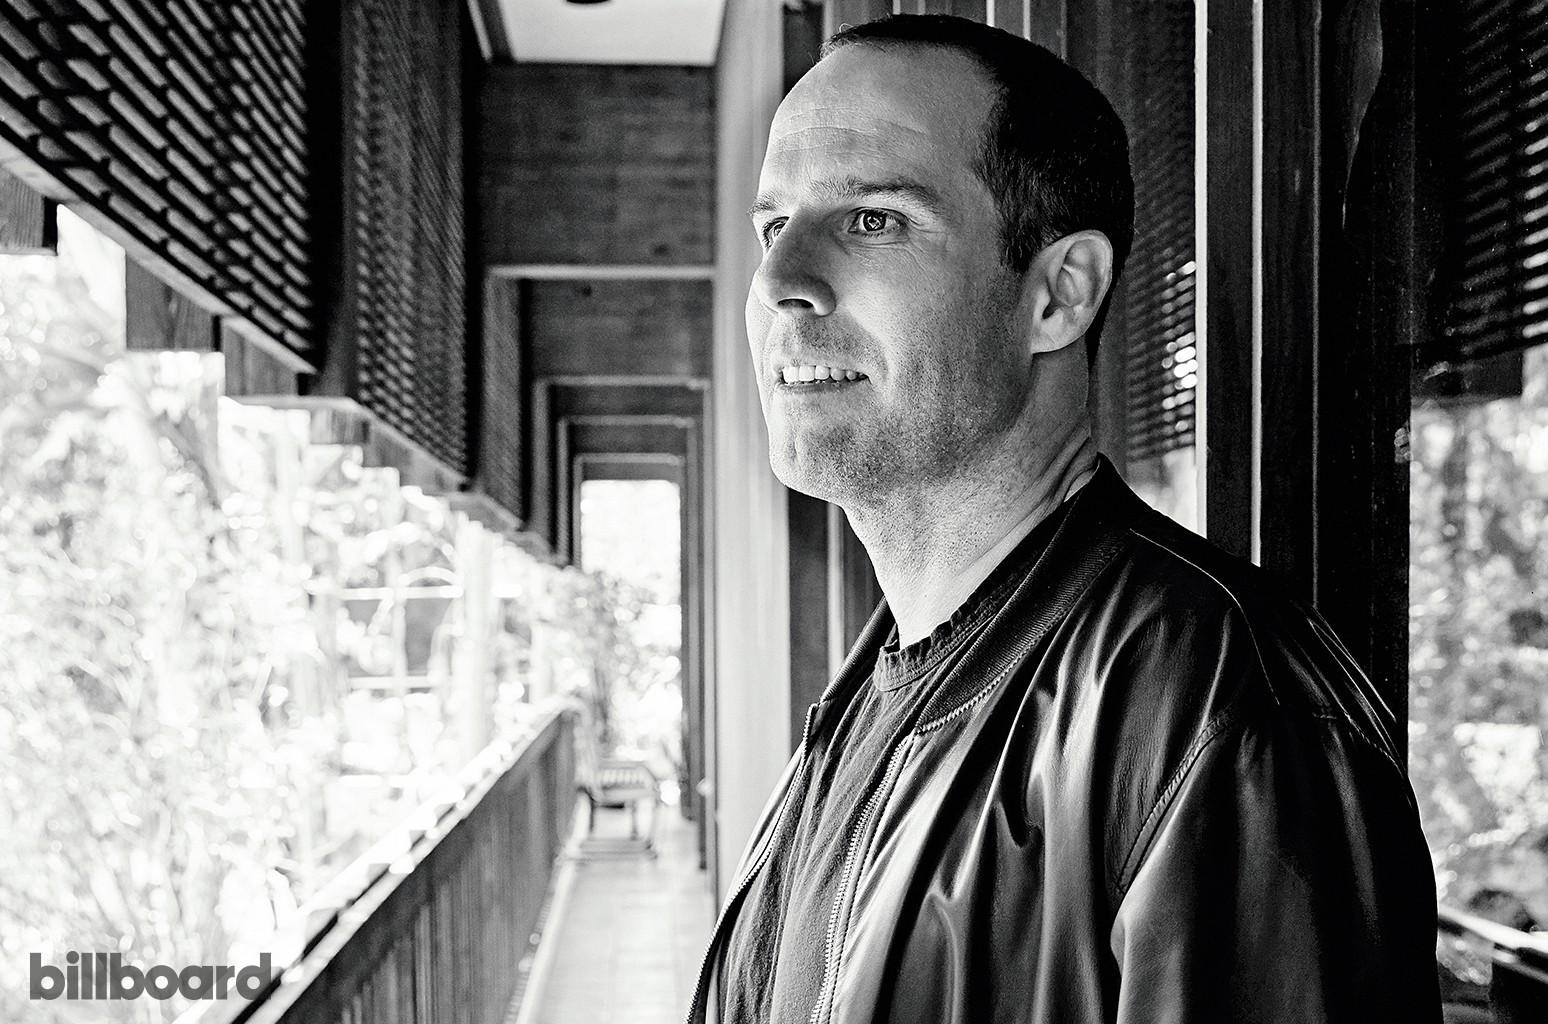 Cameron Strang photographed April 25, 2016 at Warner Bros Records in Burbank, Calif.